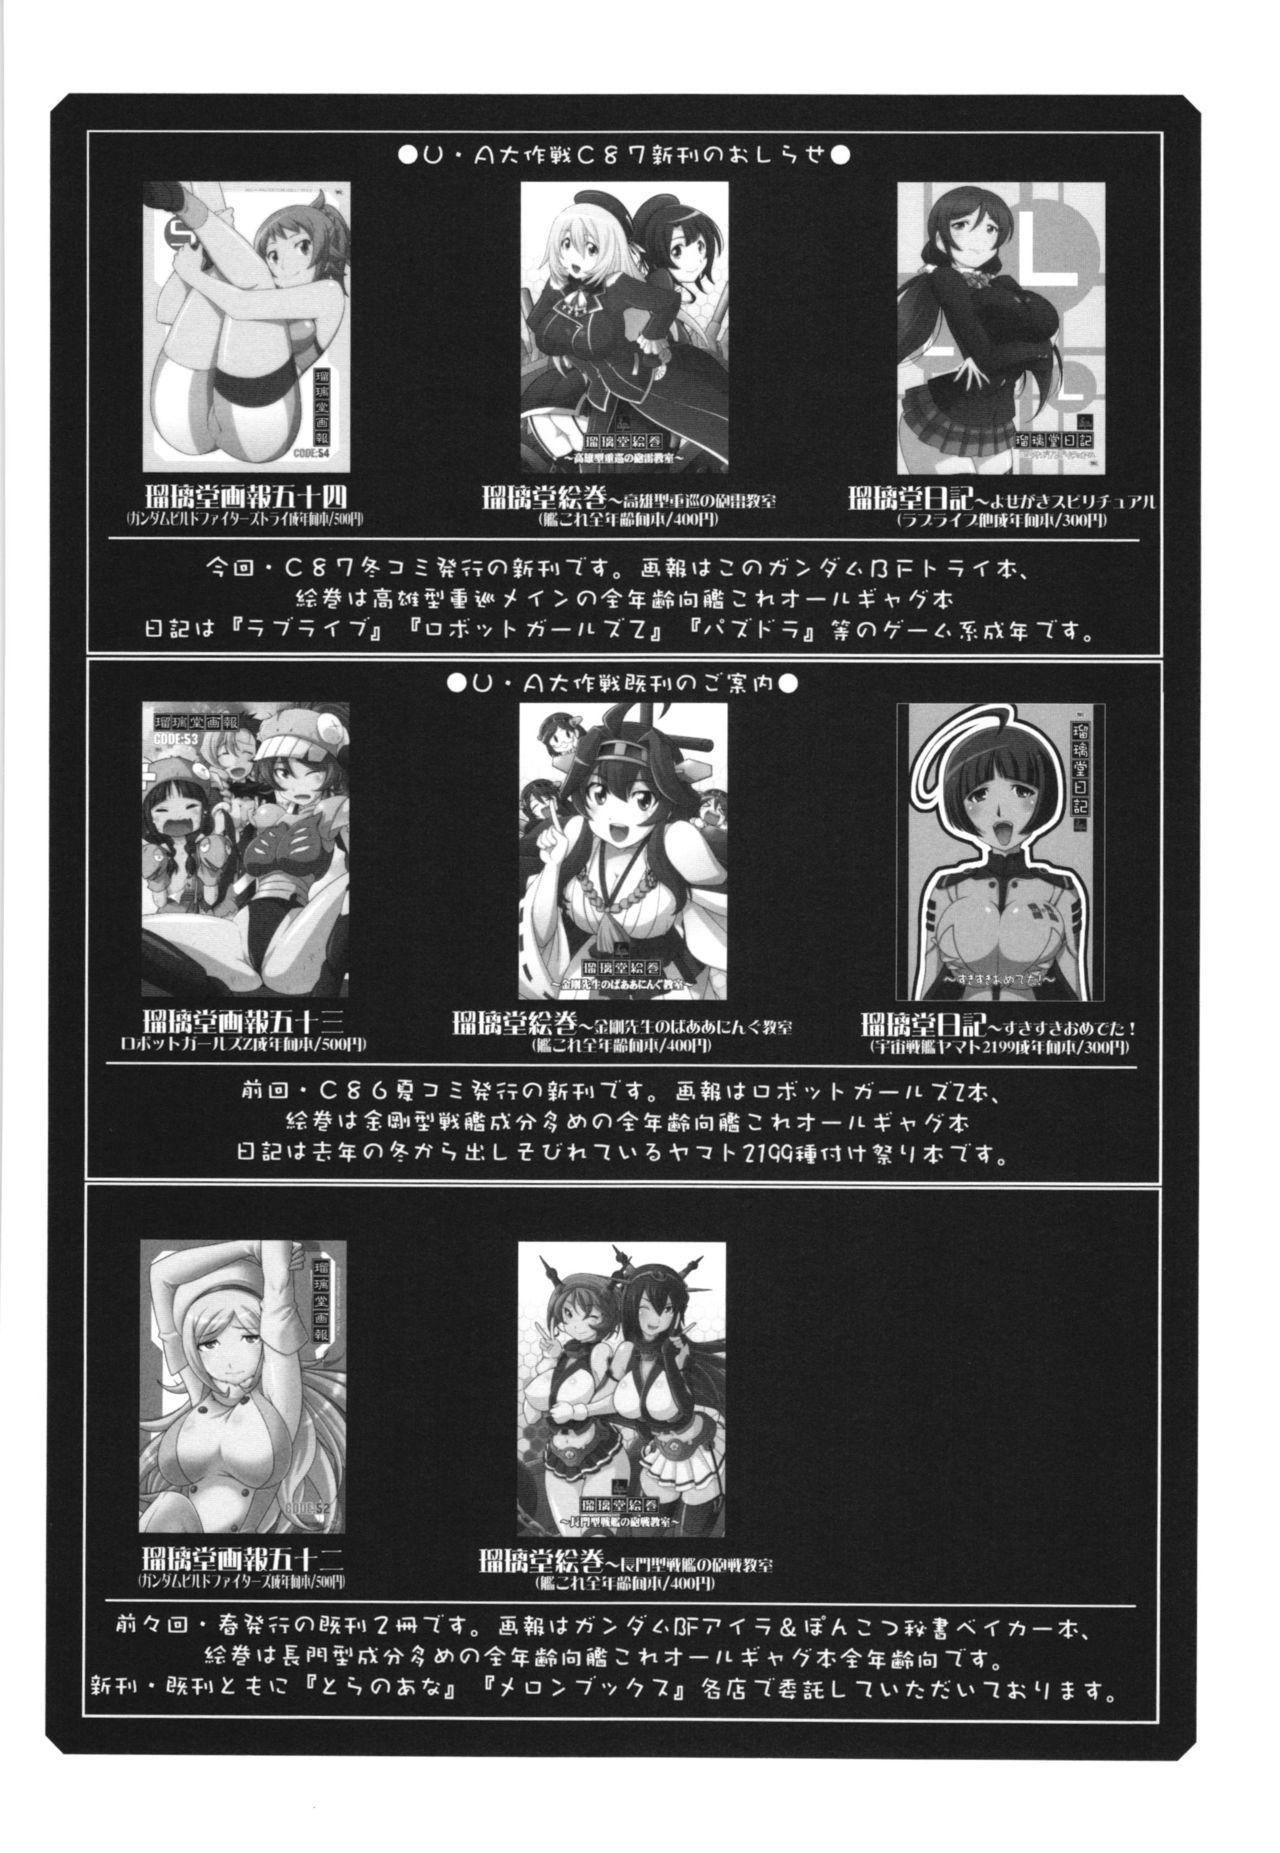 Ruridou Gahou CODE:54 + Kaijou Genteibon 31